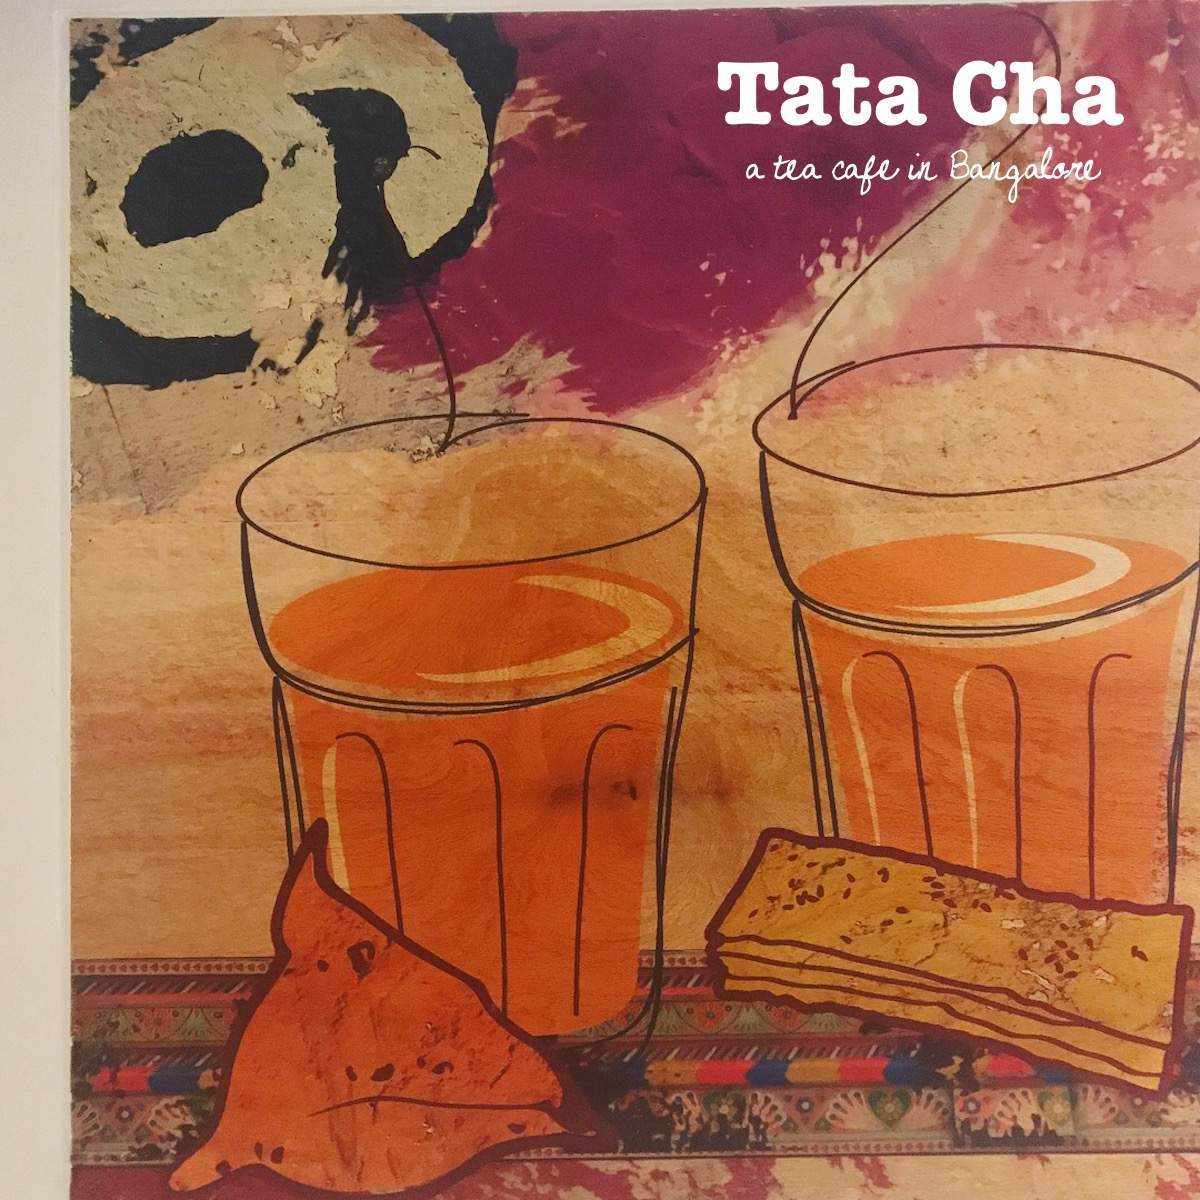 tata-cha-bangalore